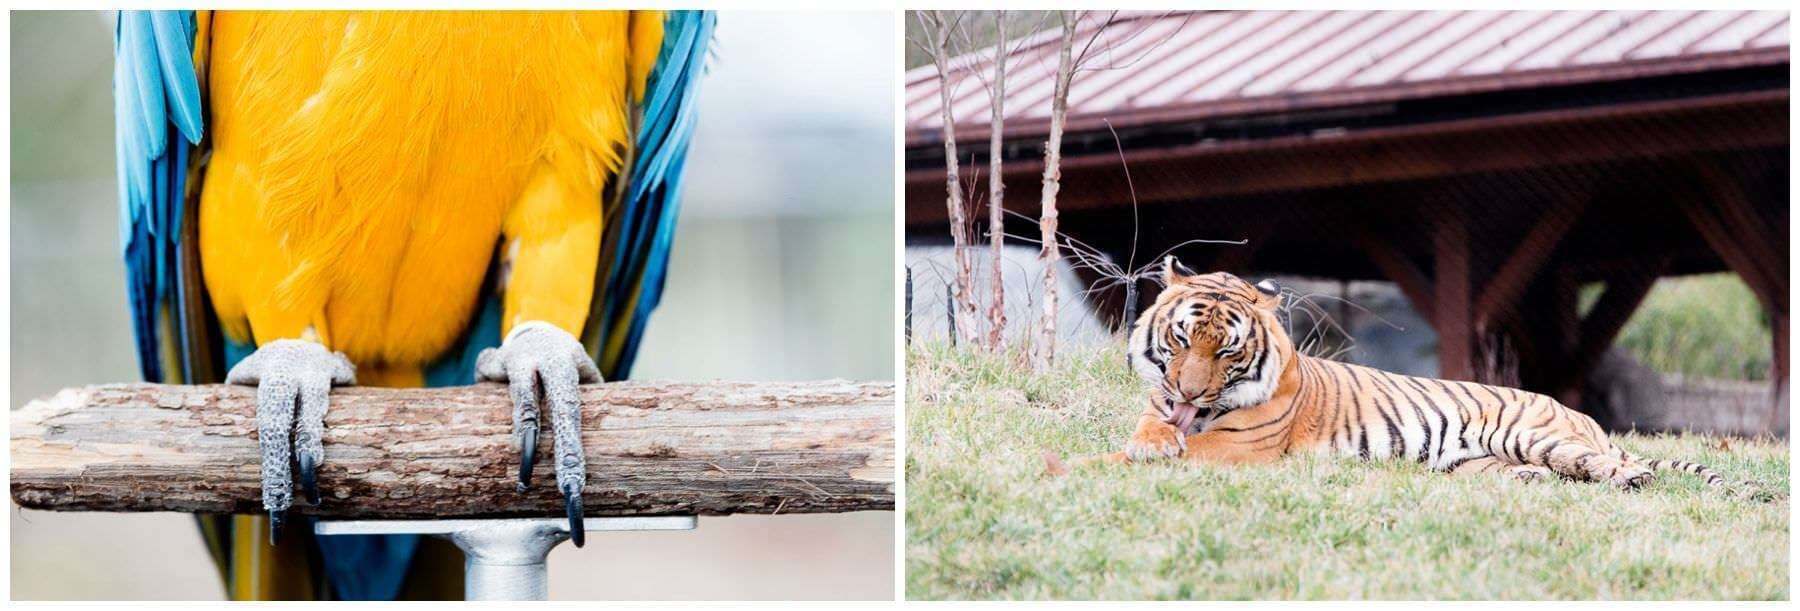 Gibbon Trails & Langur Landing